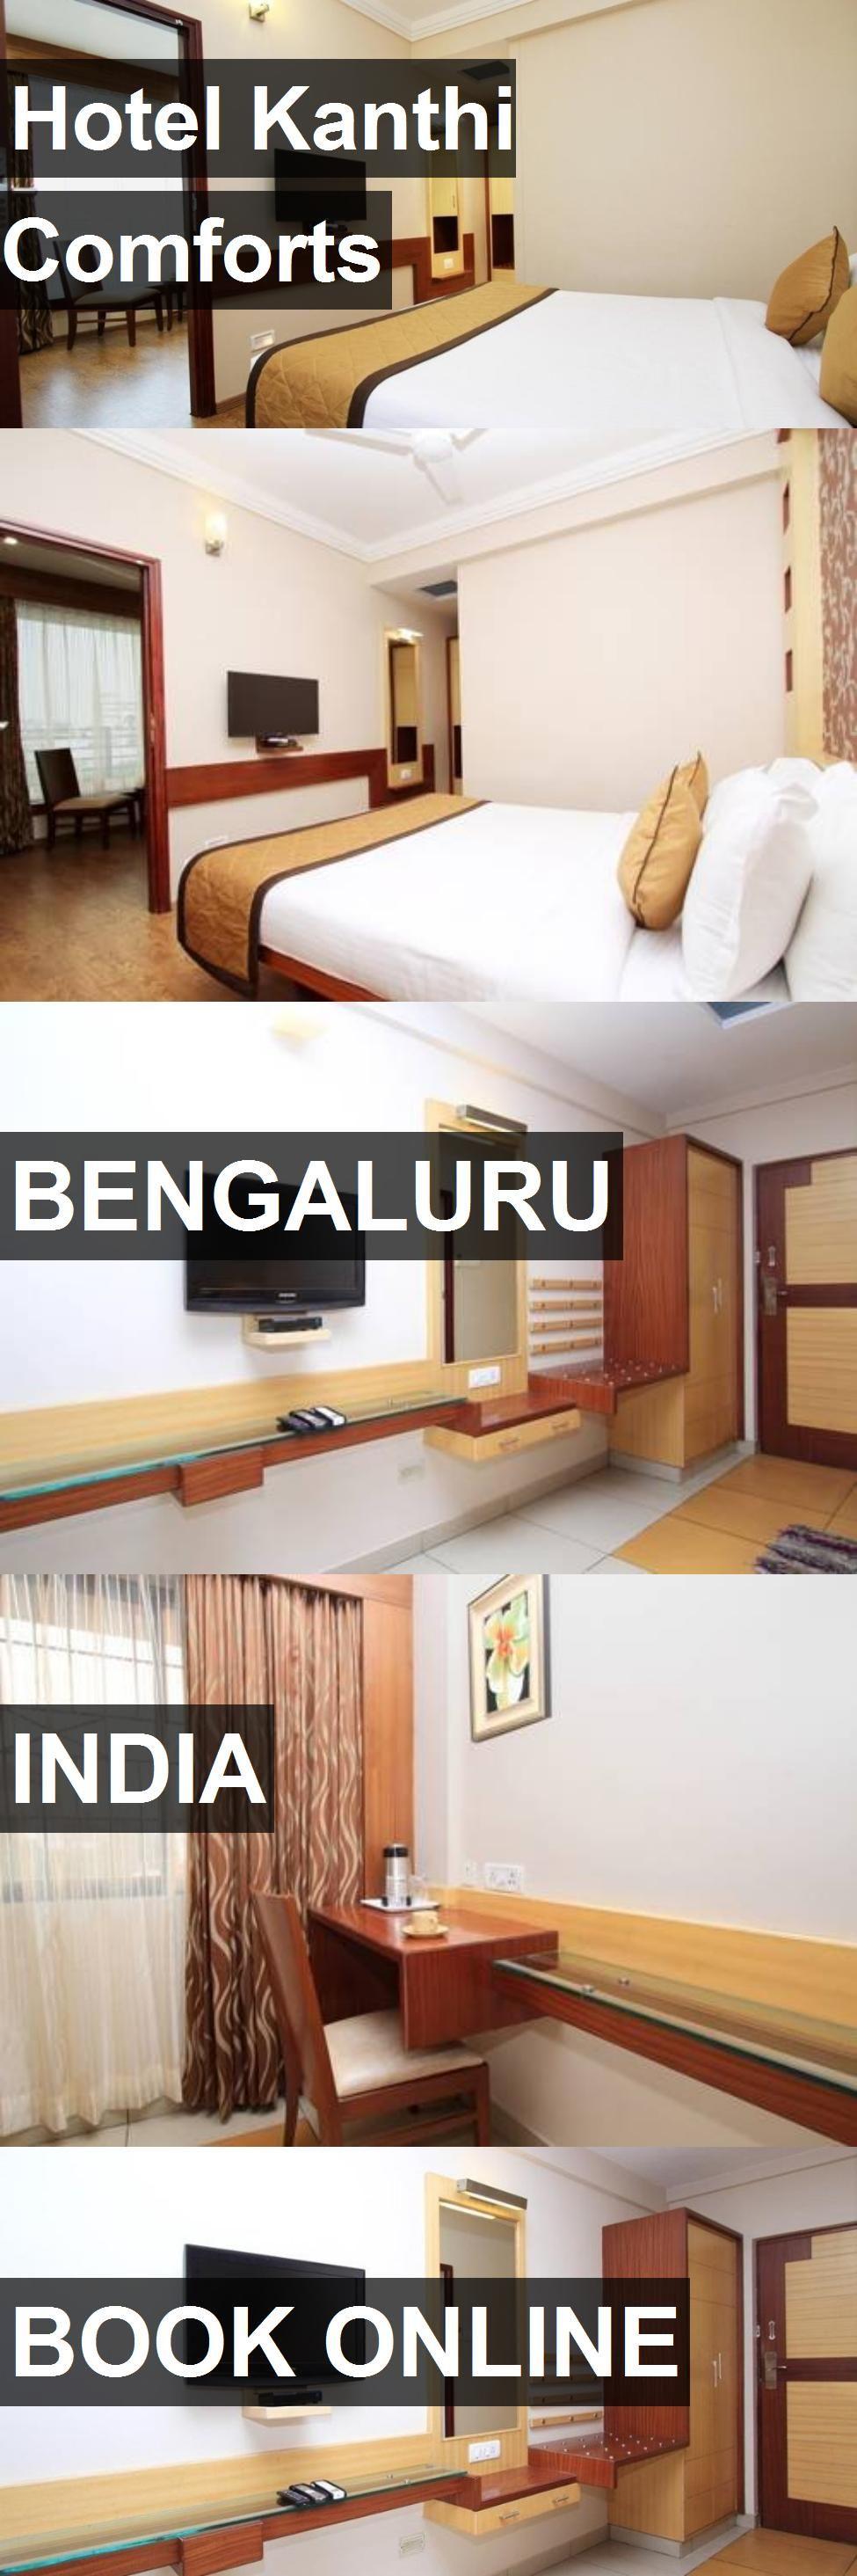 Hotel Kanthi Comforts in Bengaluru, India. For more